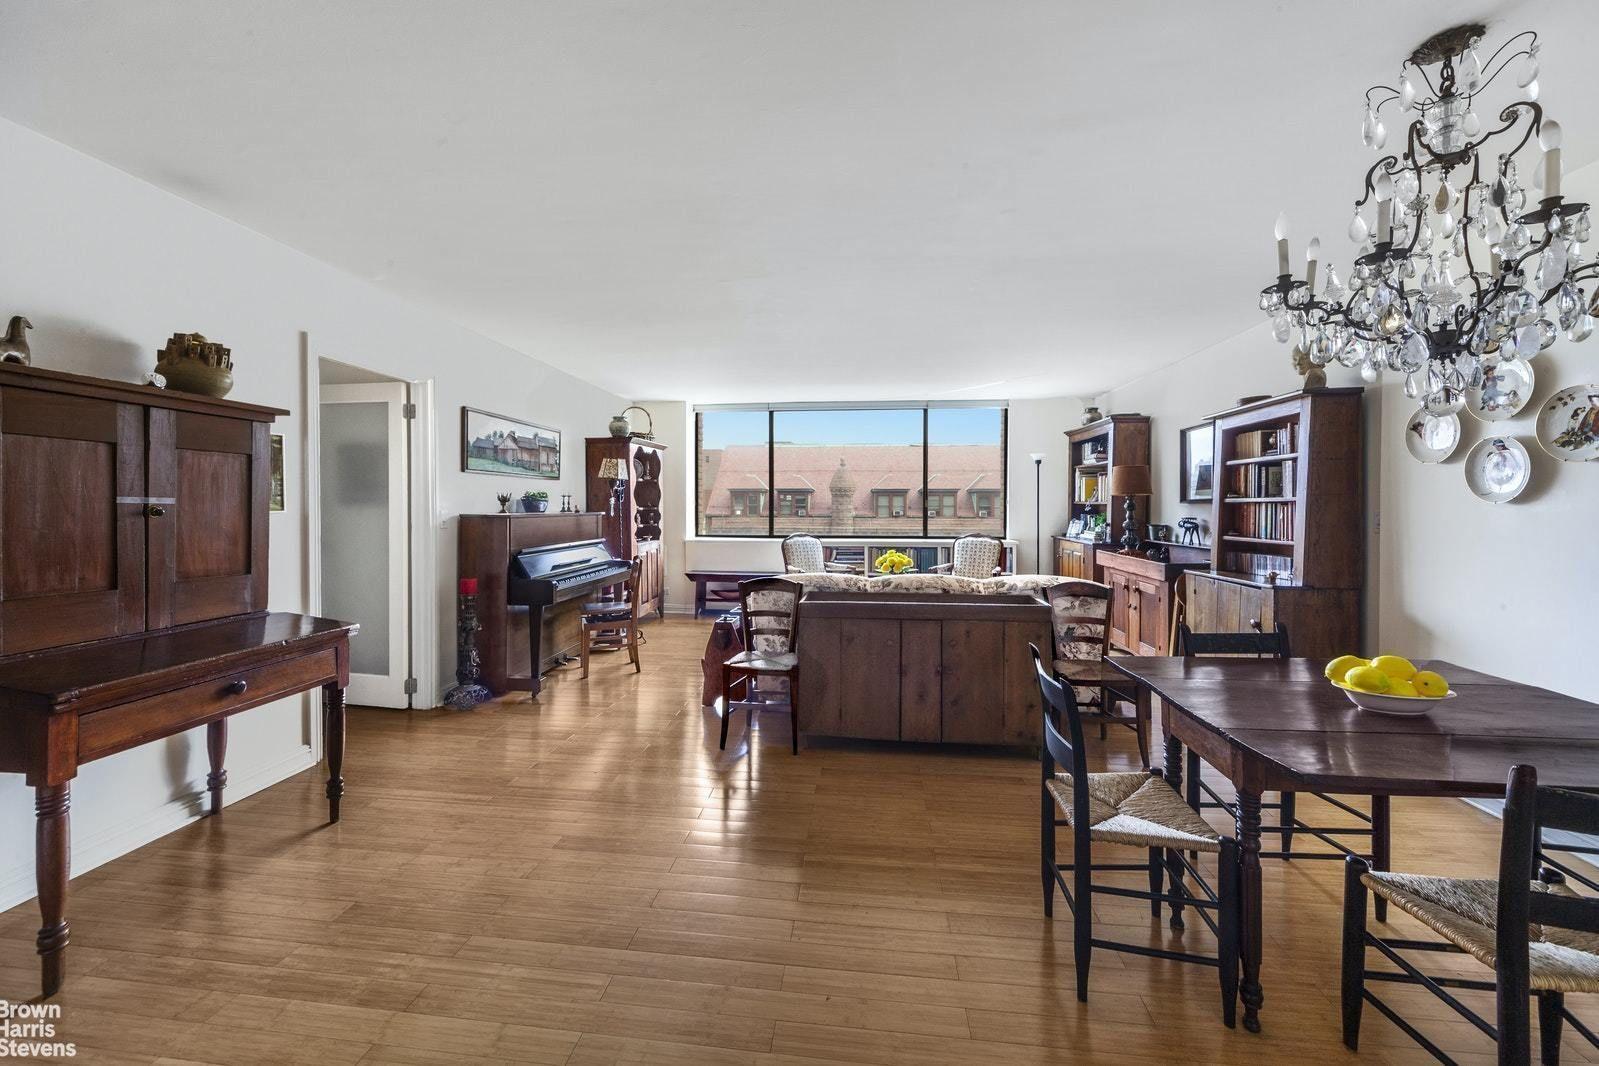 Apartment for sale at 386 Columbus Avenue, Apt 10A